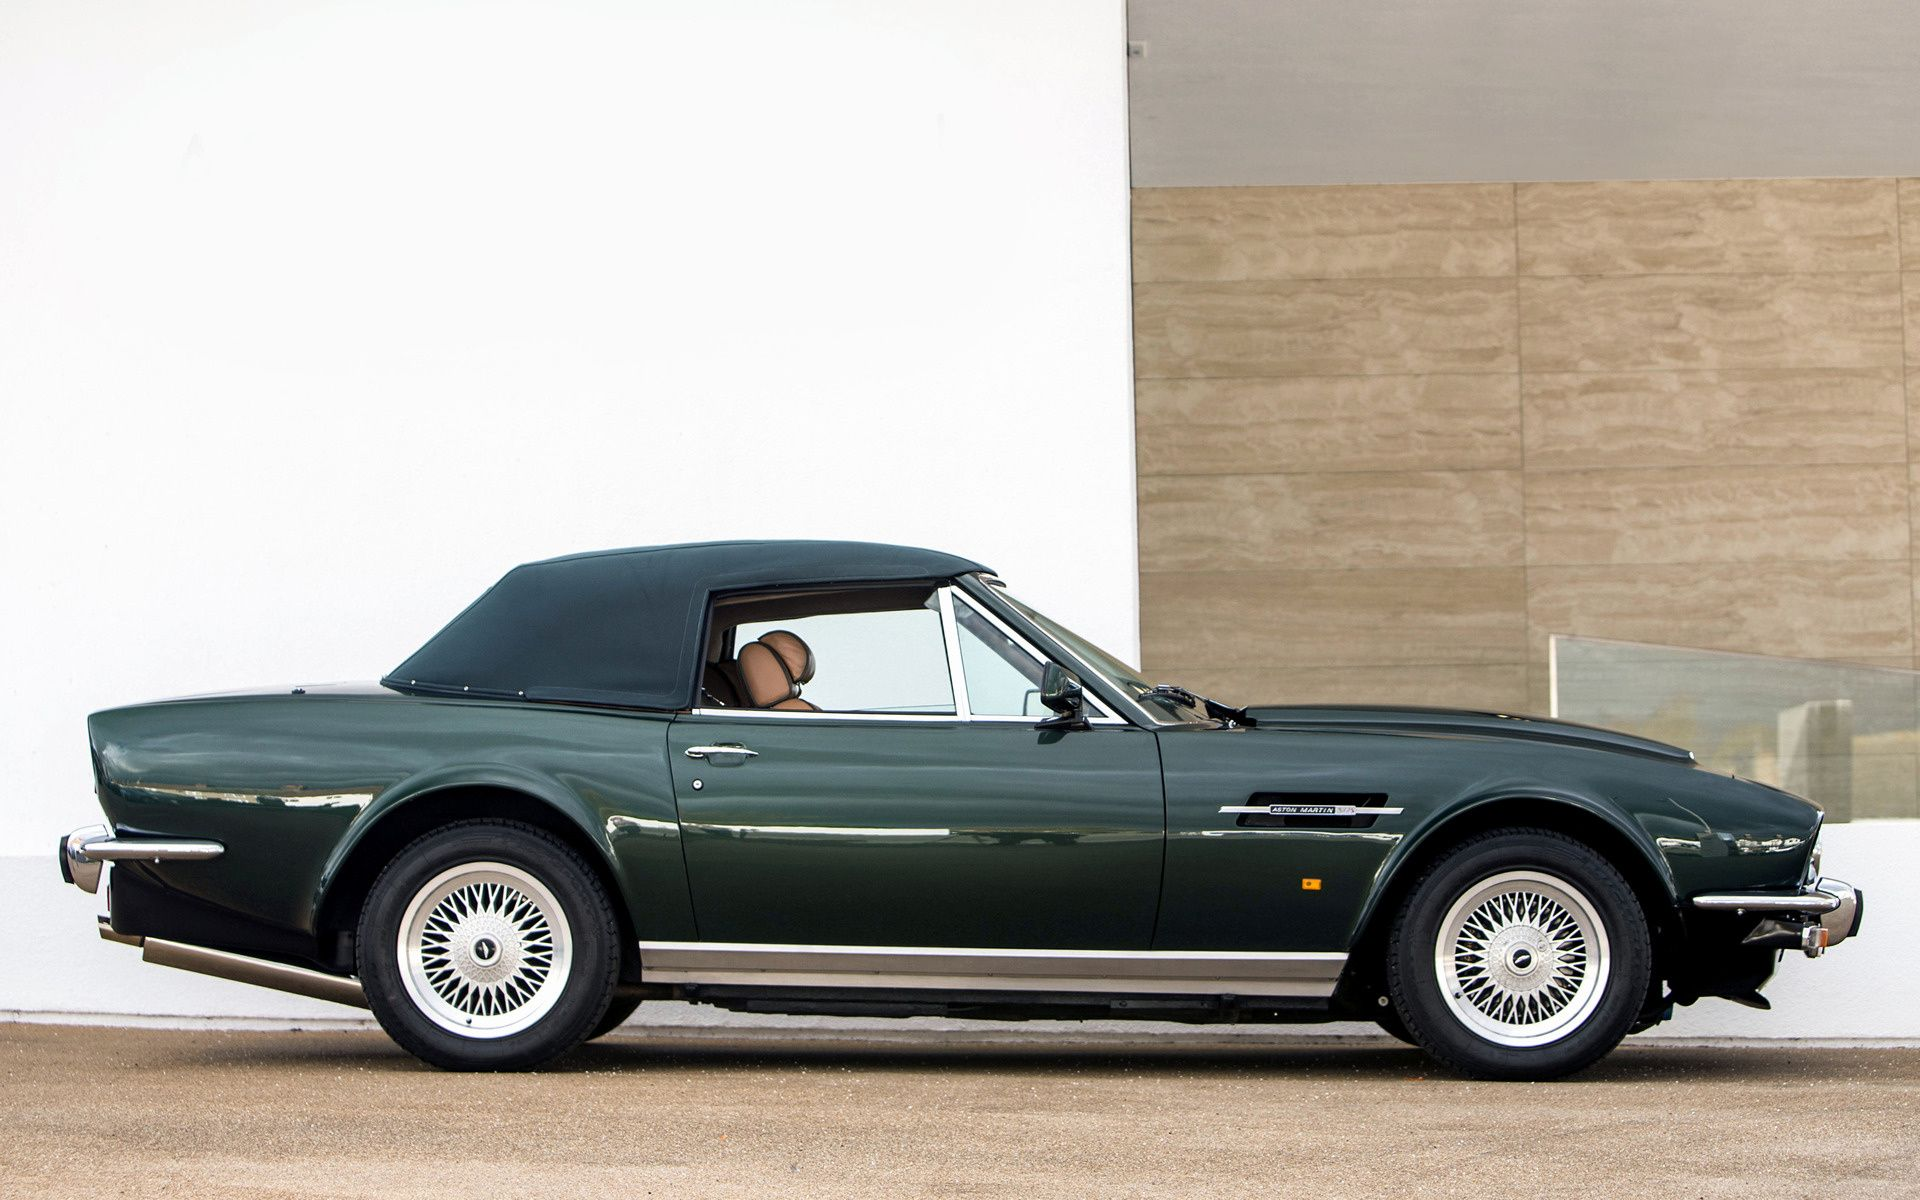 1989 Aston Martin V8 Vantage Volante Prince Of Wales Traumauto Autos